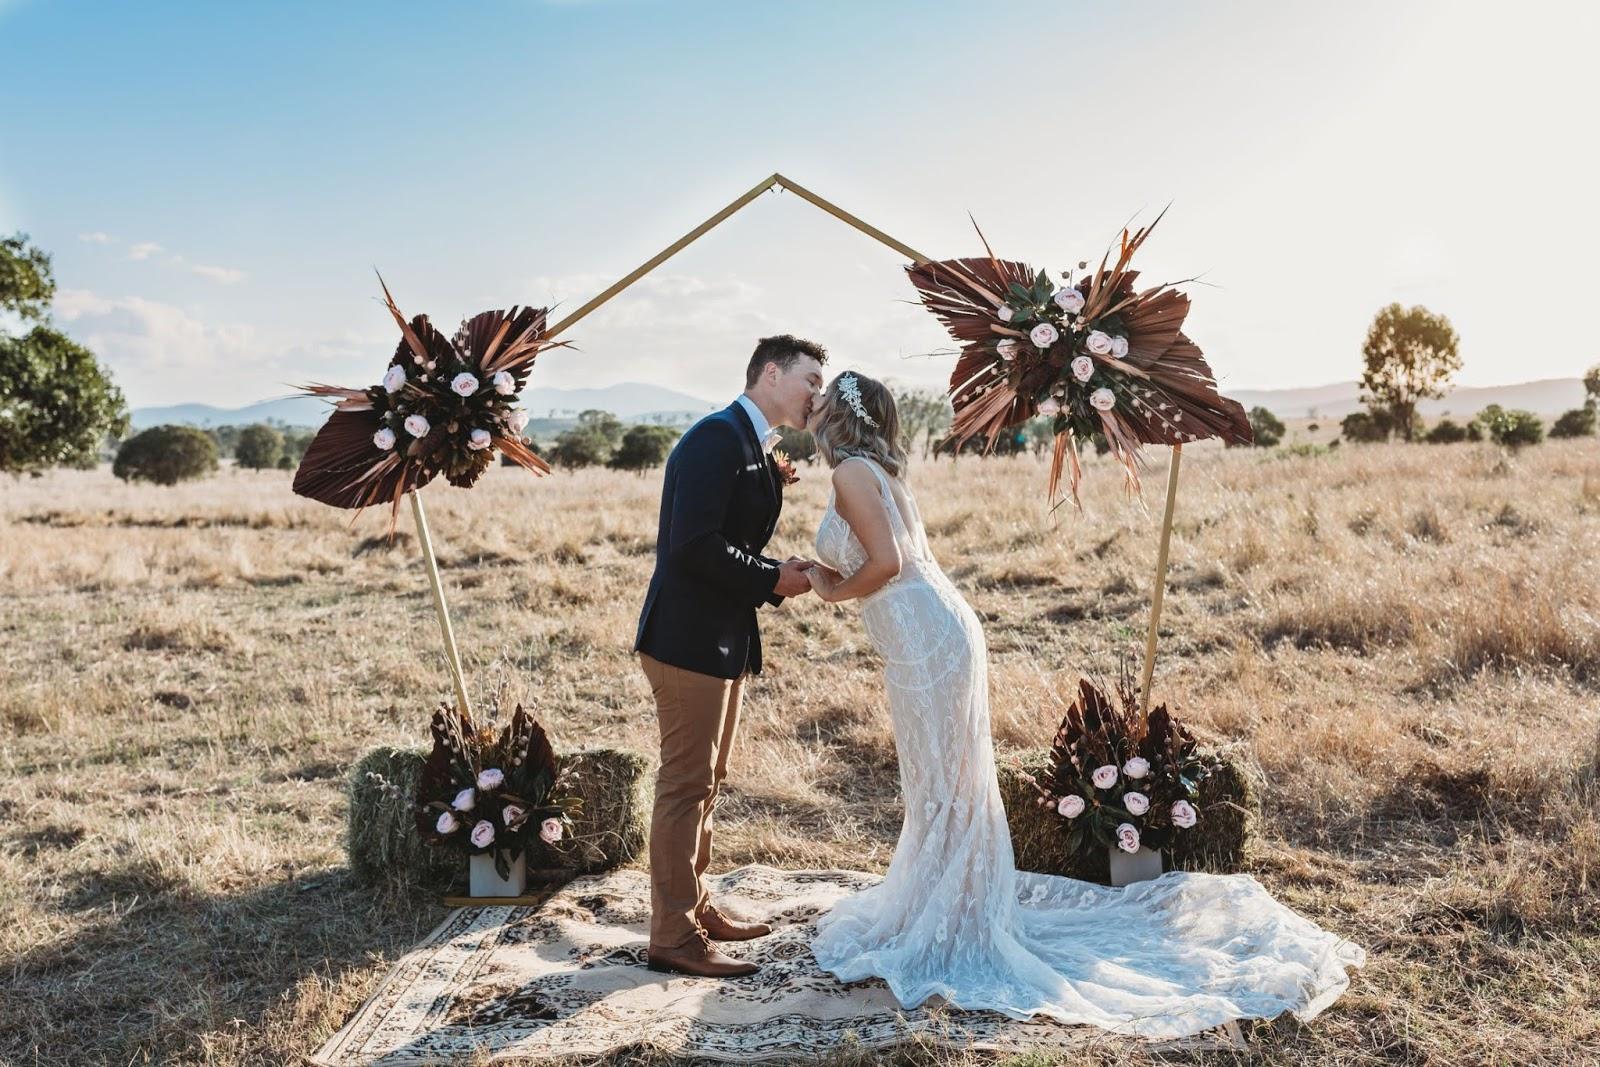 STYLED SHOOT: RUSTIC BOHEMIAN WEDDING EDITORIAL | MOUNT LARCOM QLD